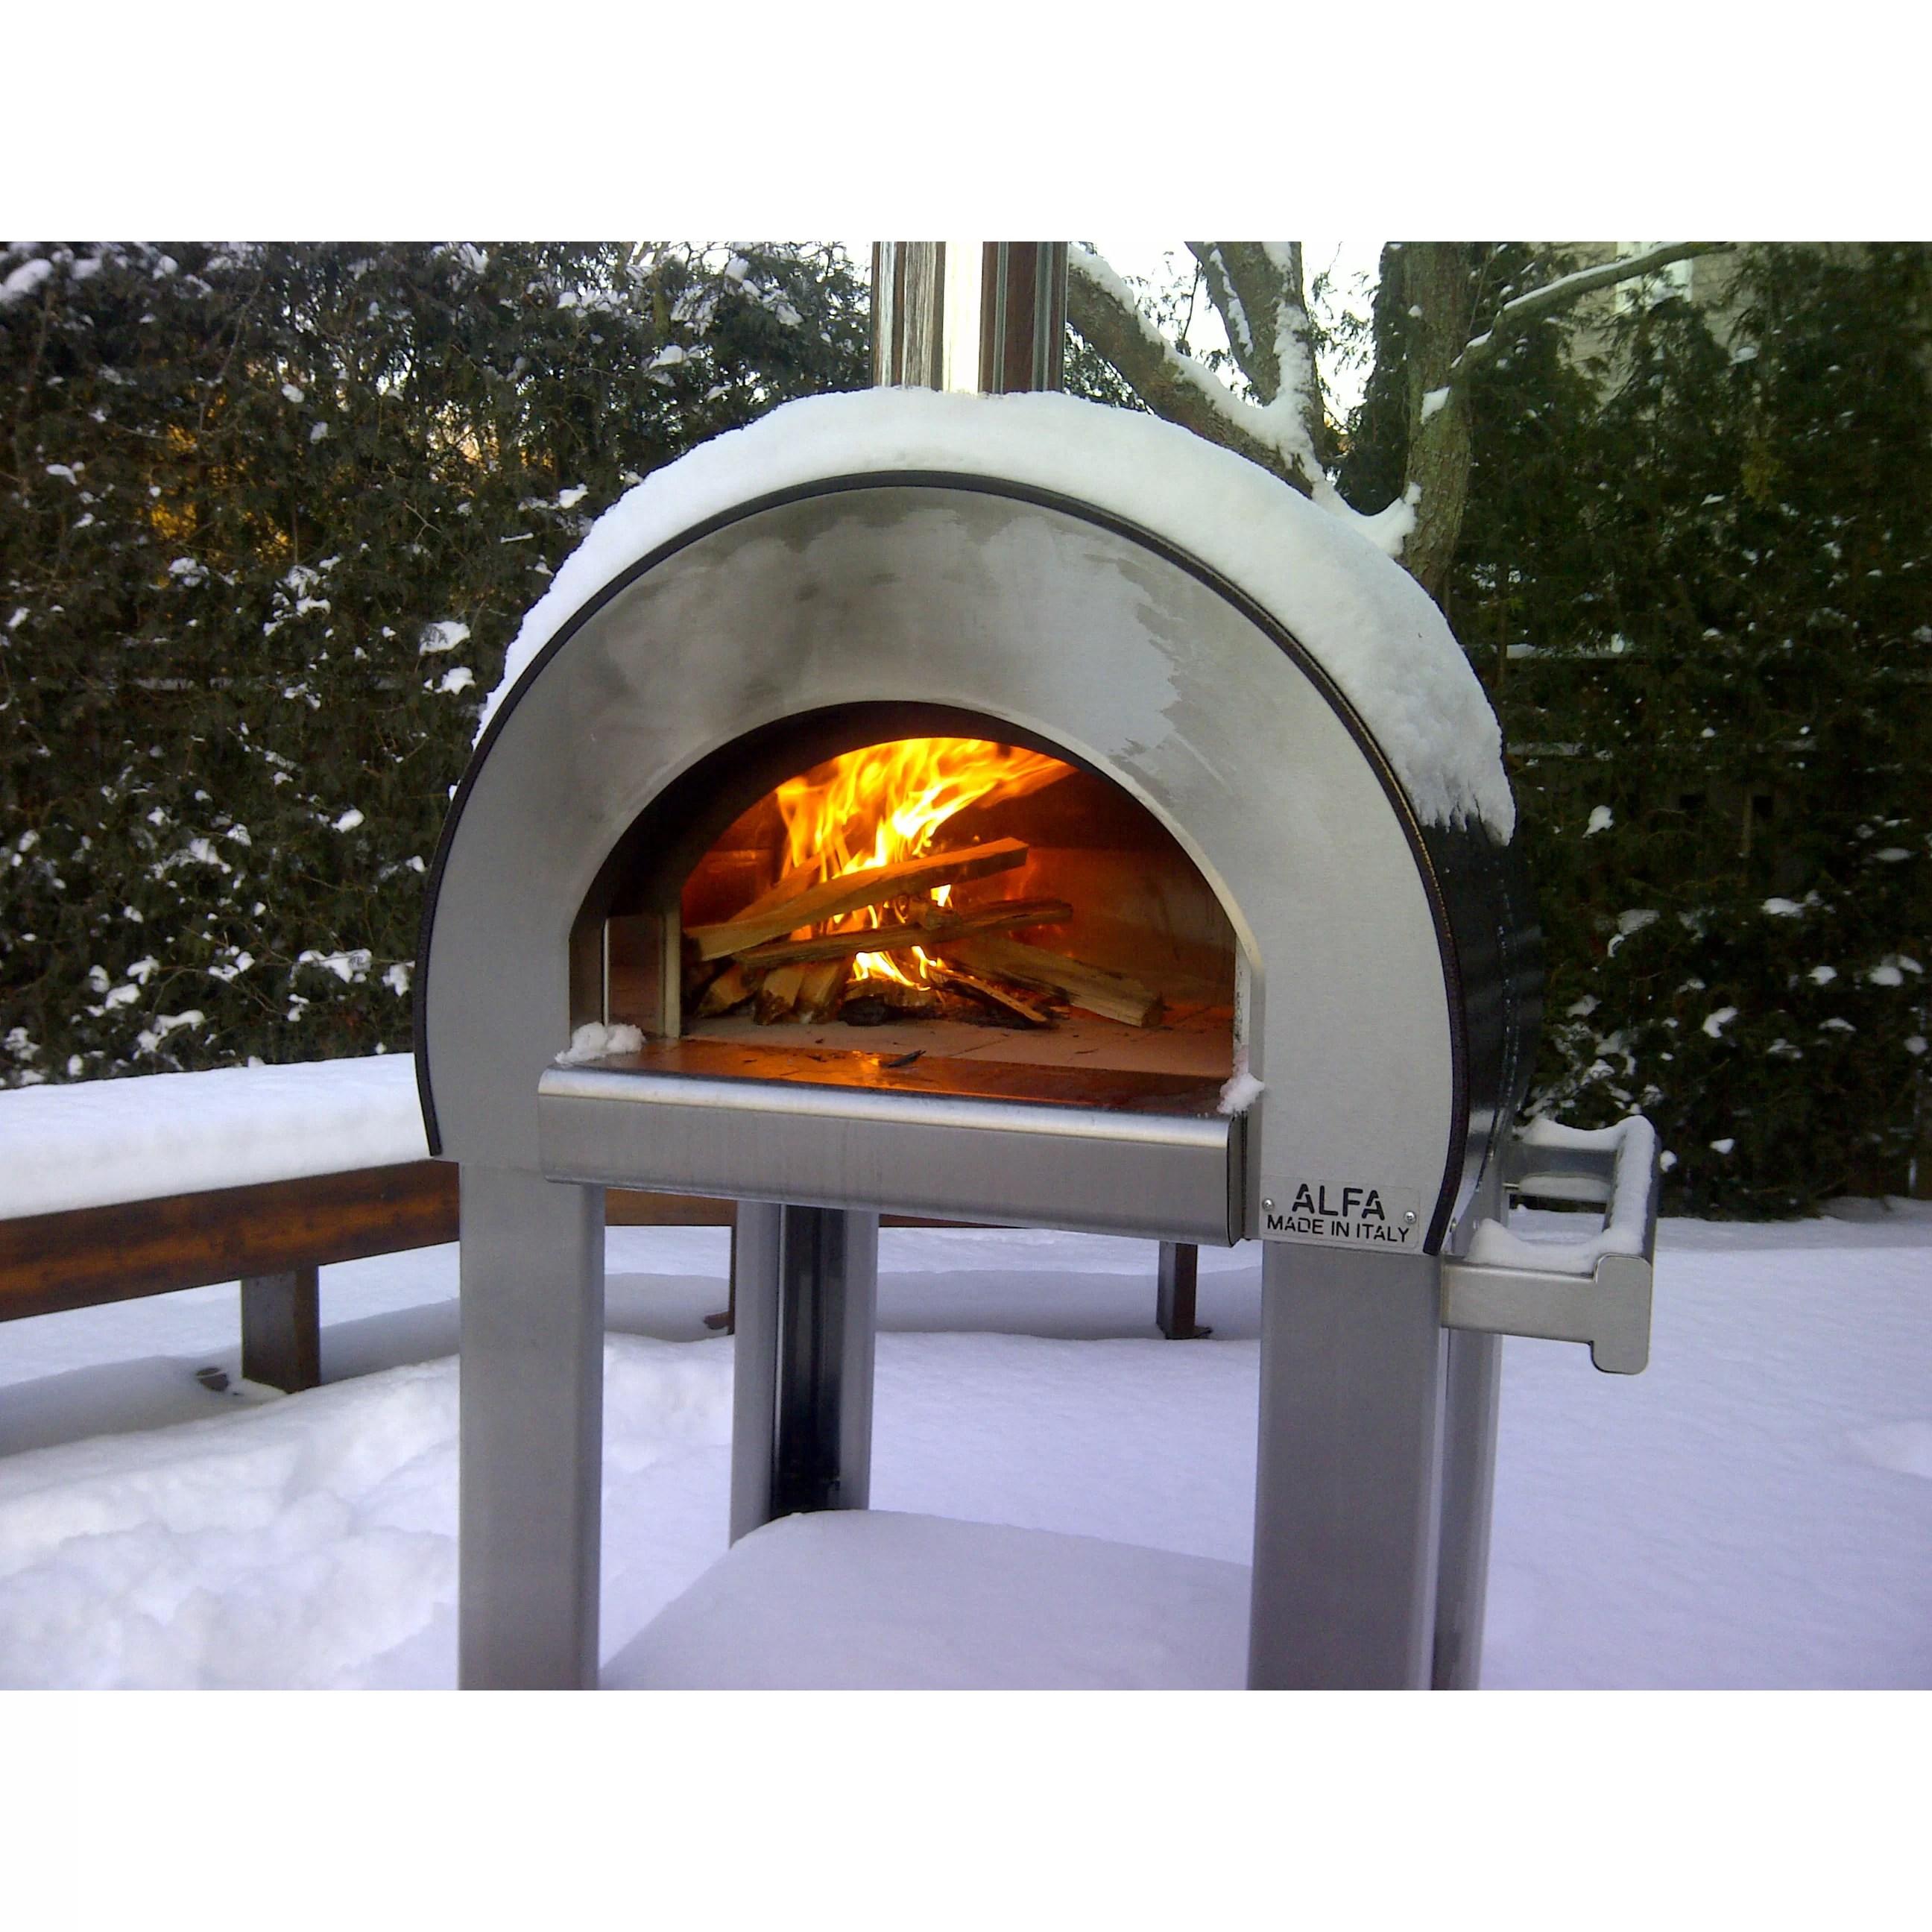 Alfa Pizza Forno 5 Wood Burning Pizza Oven  Reviews  Wayfair